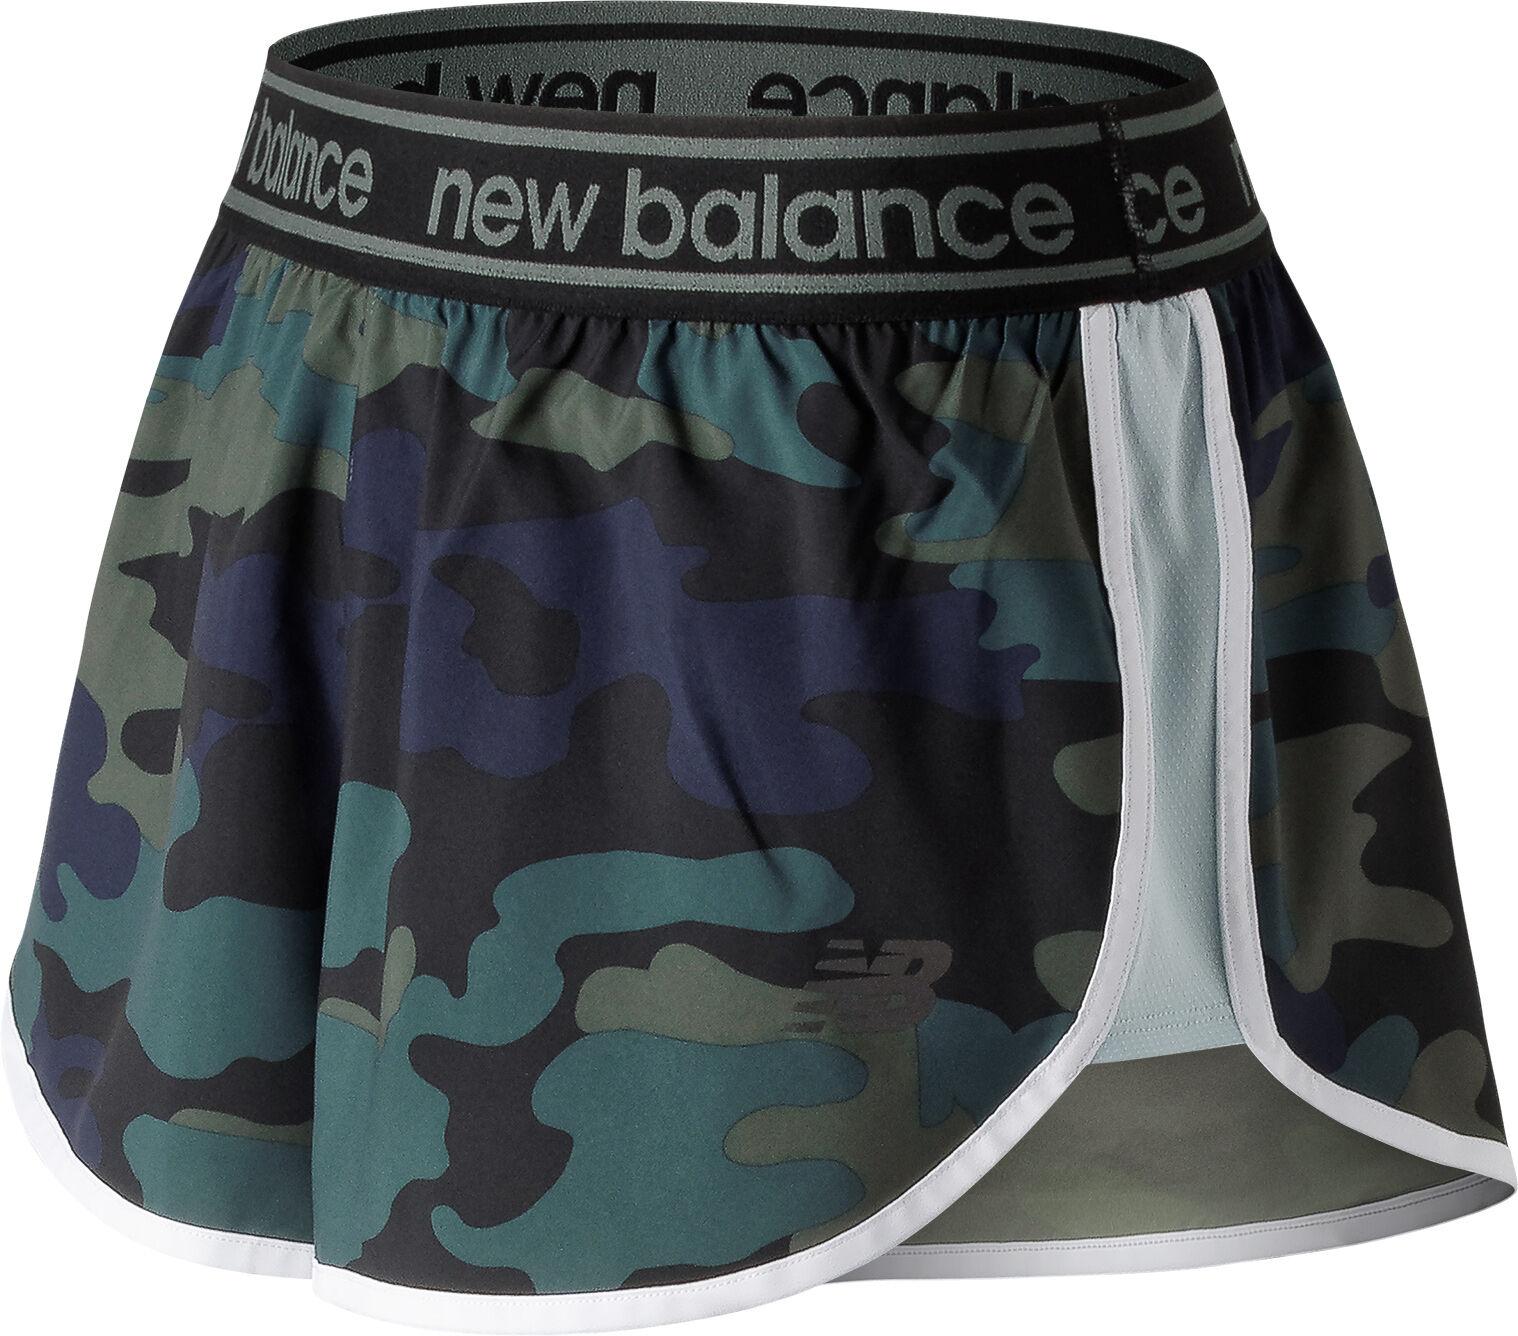 calzonas new balance